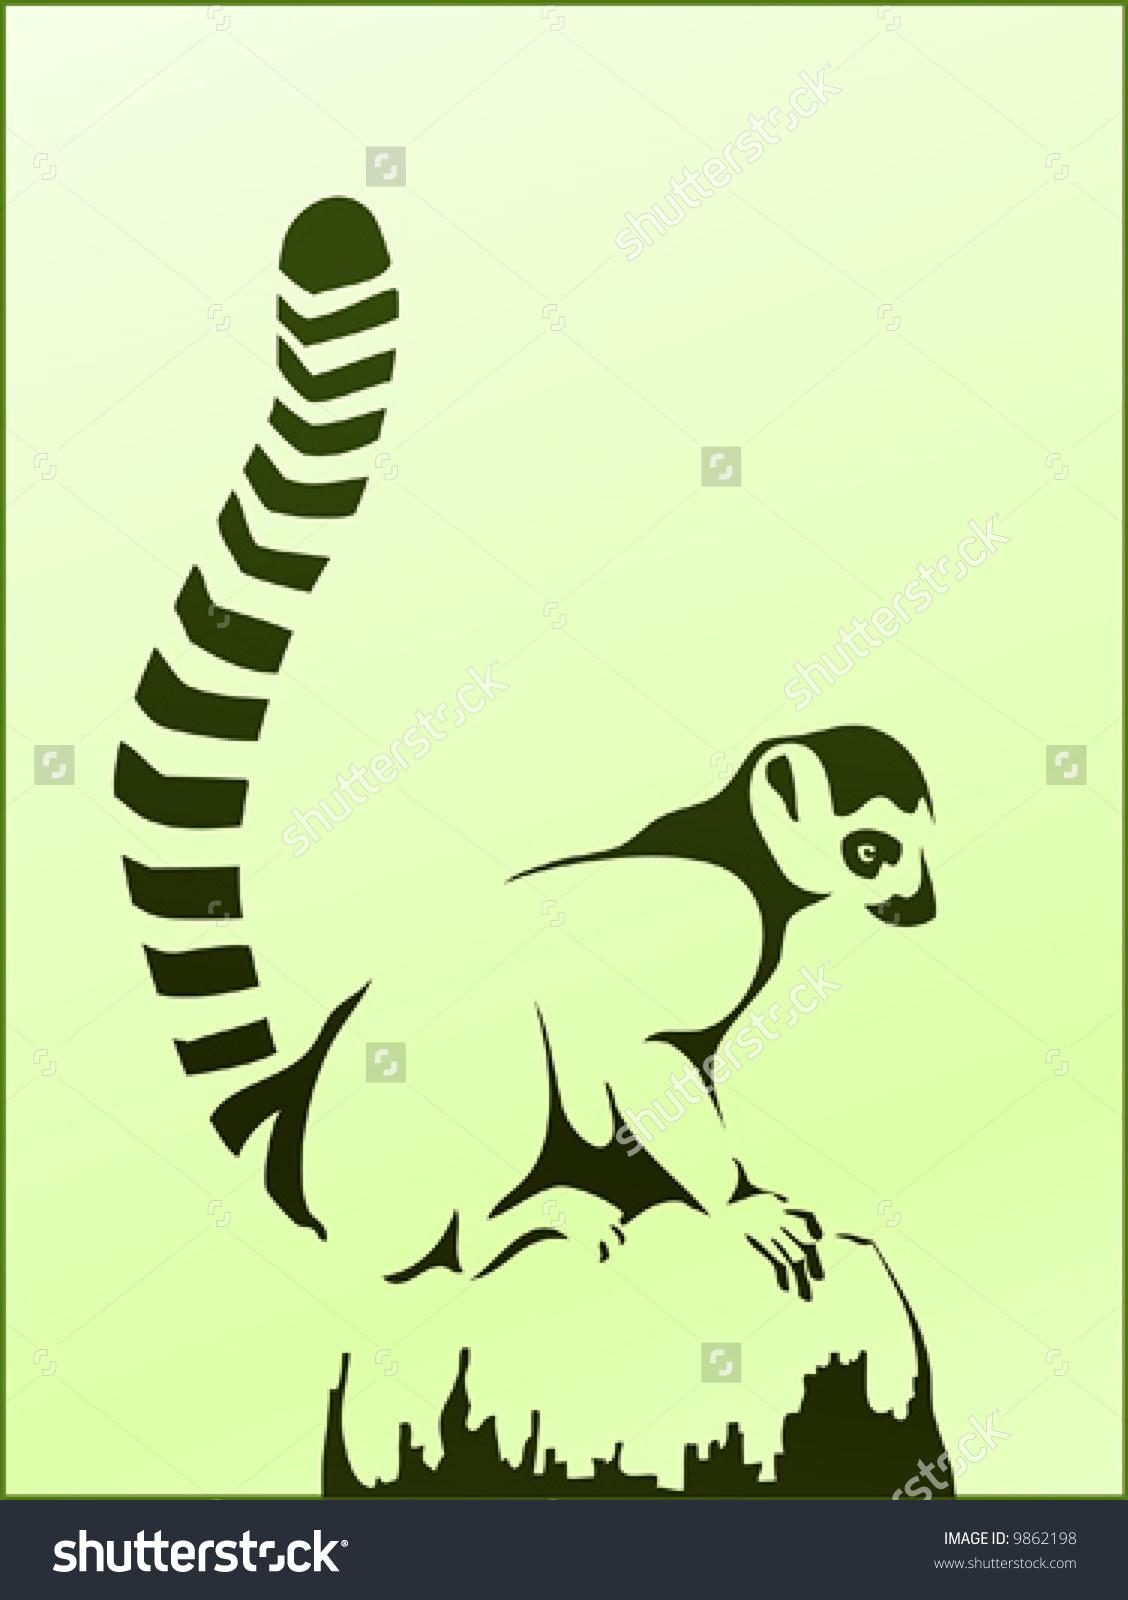 Ringtailed Lemur Or Lemur Catta Sitting Stock Vector 9862198.